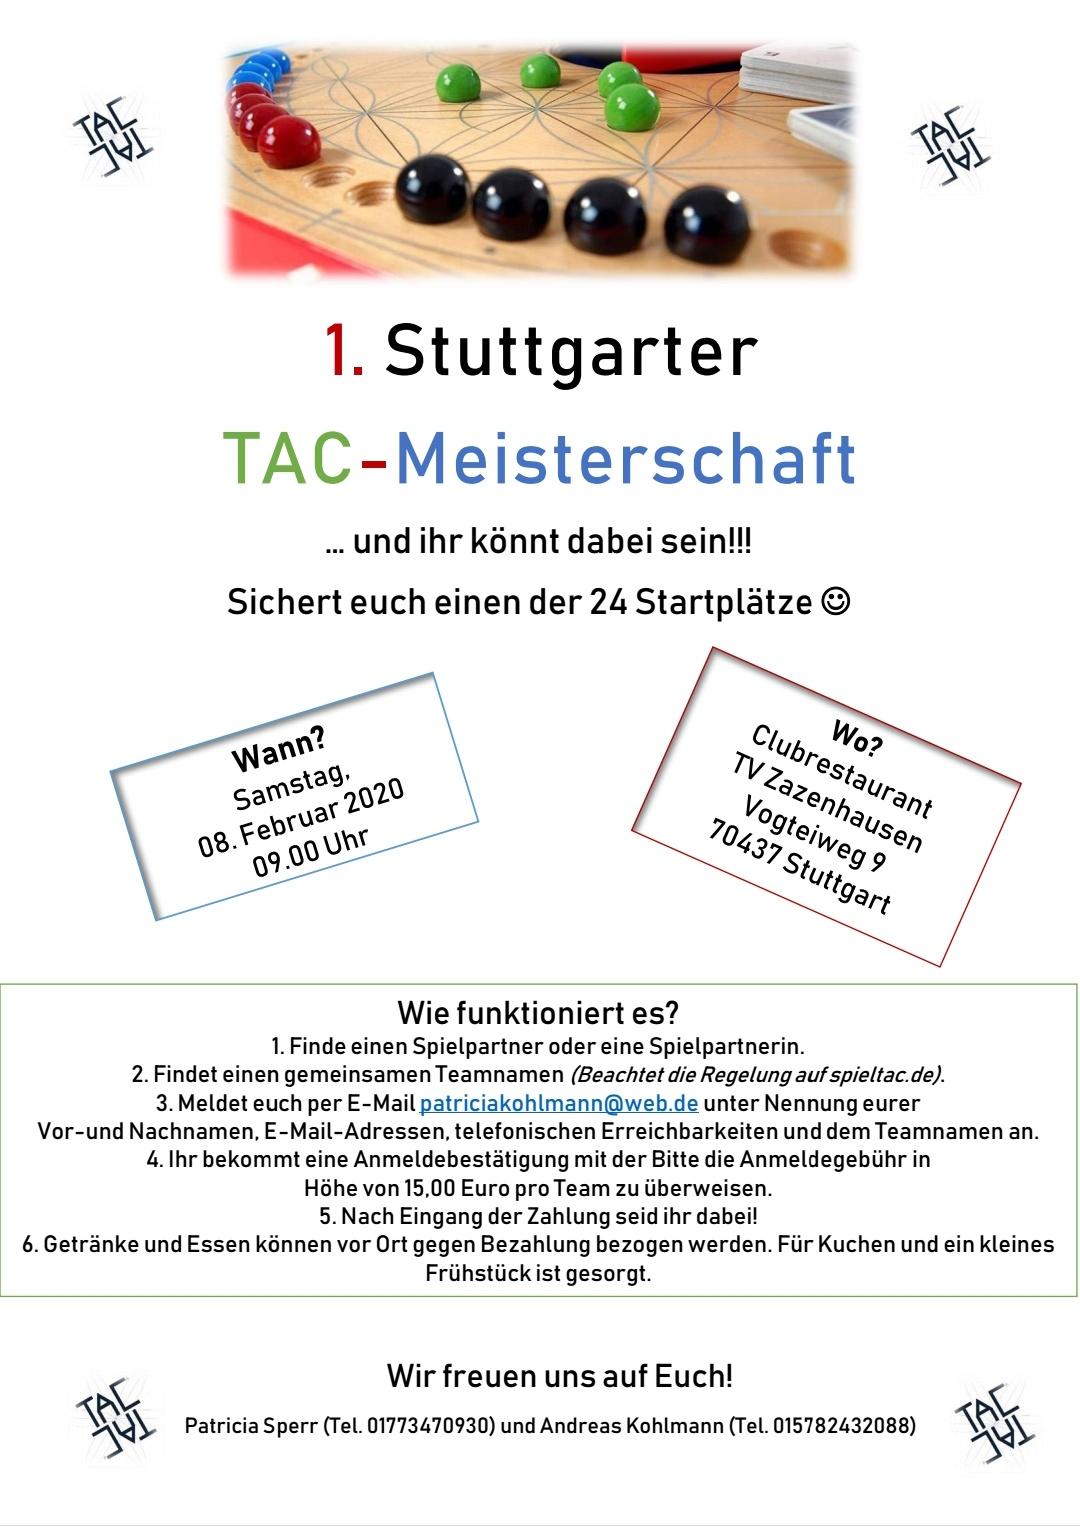 click to zoomwww.spiel-tac.de/images/1-Stuttgarter-TAC-Meisterschaft.jpg